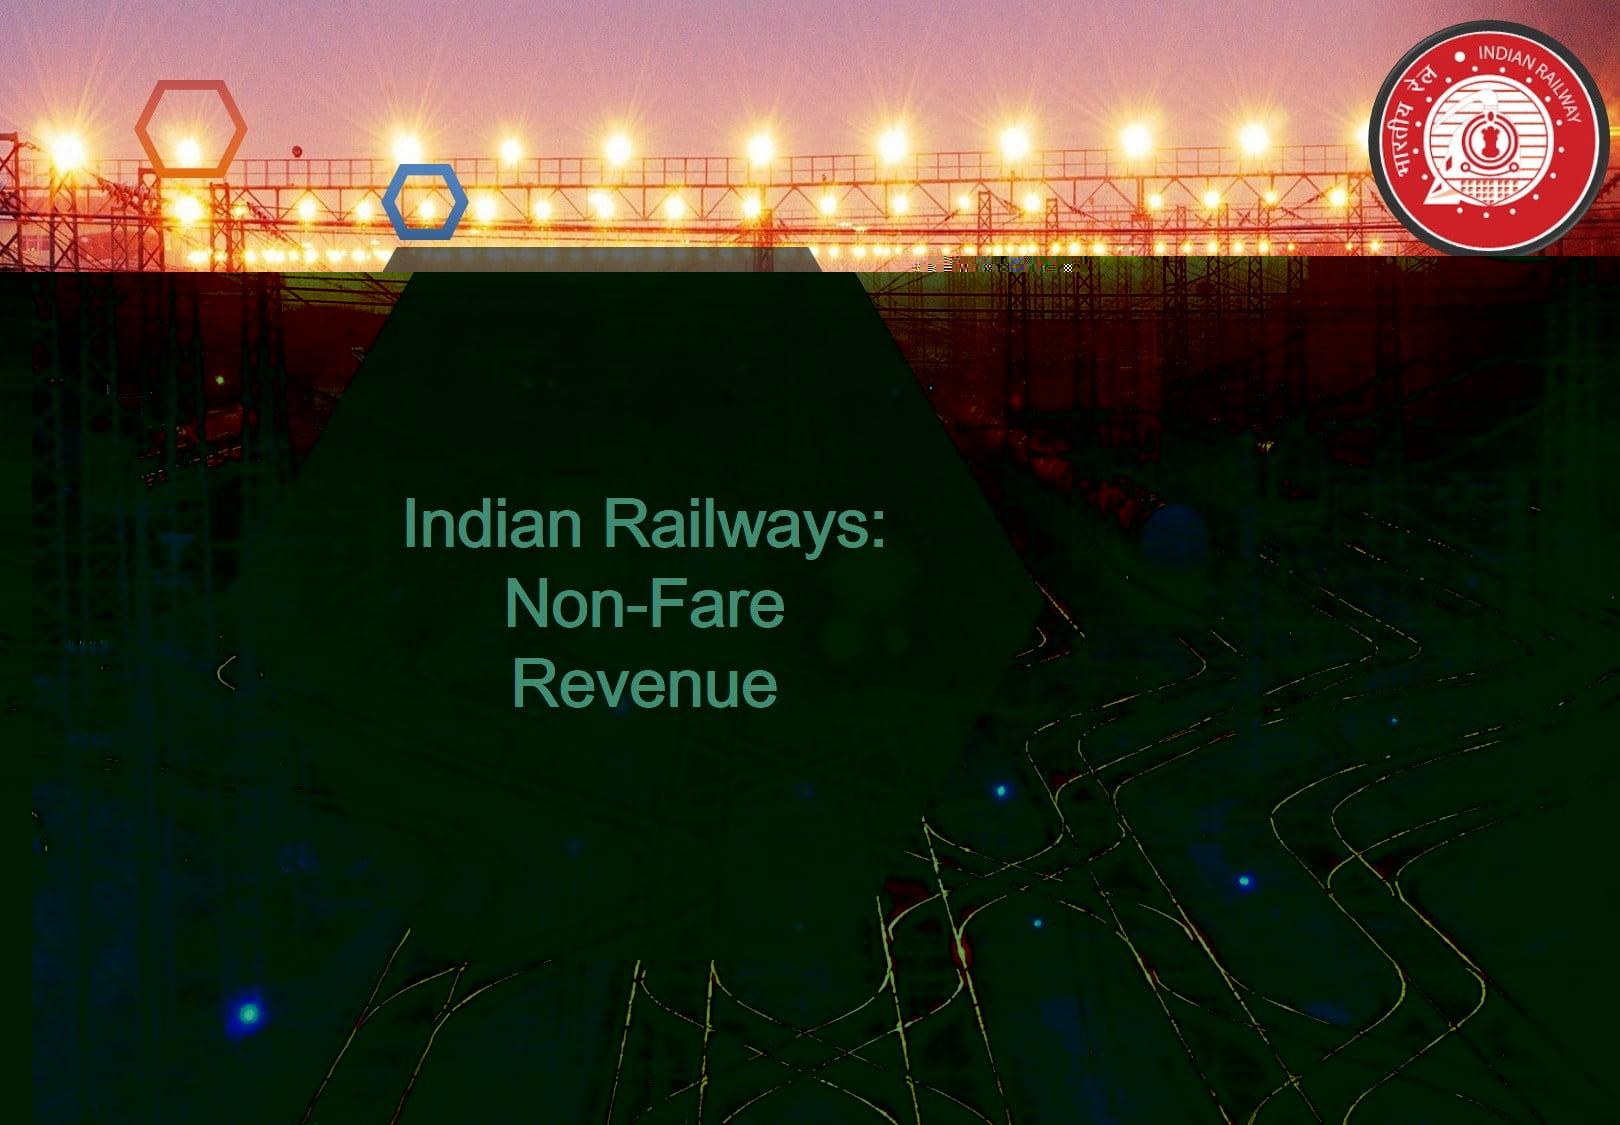 Indian Railways Innovation Challenge